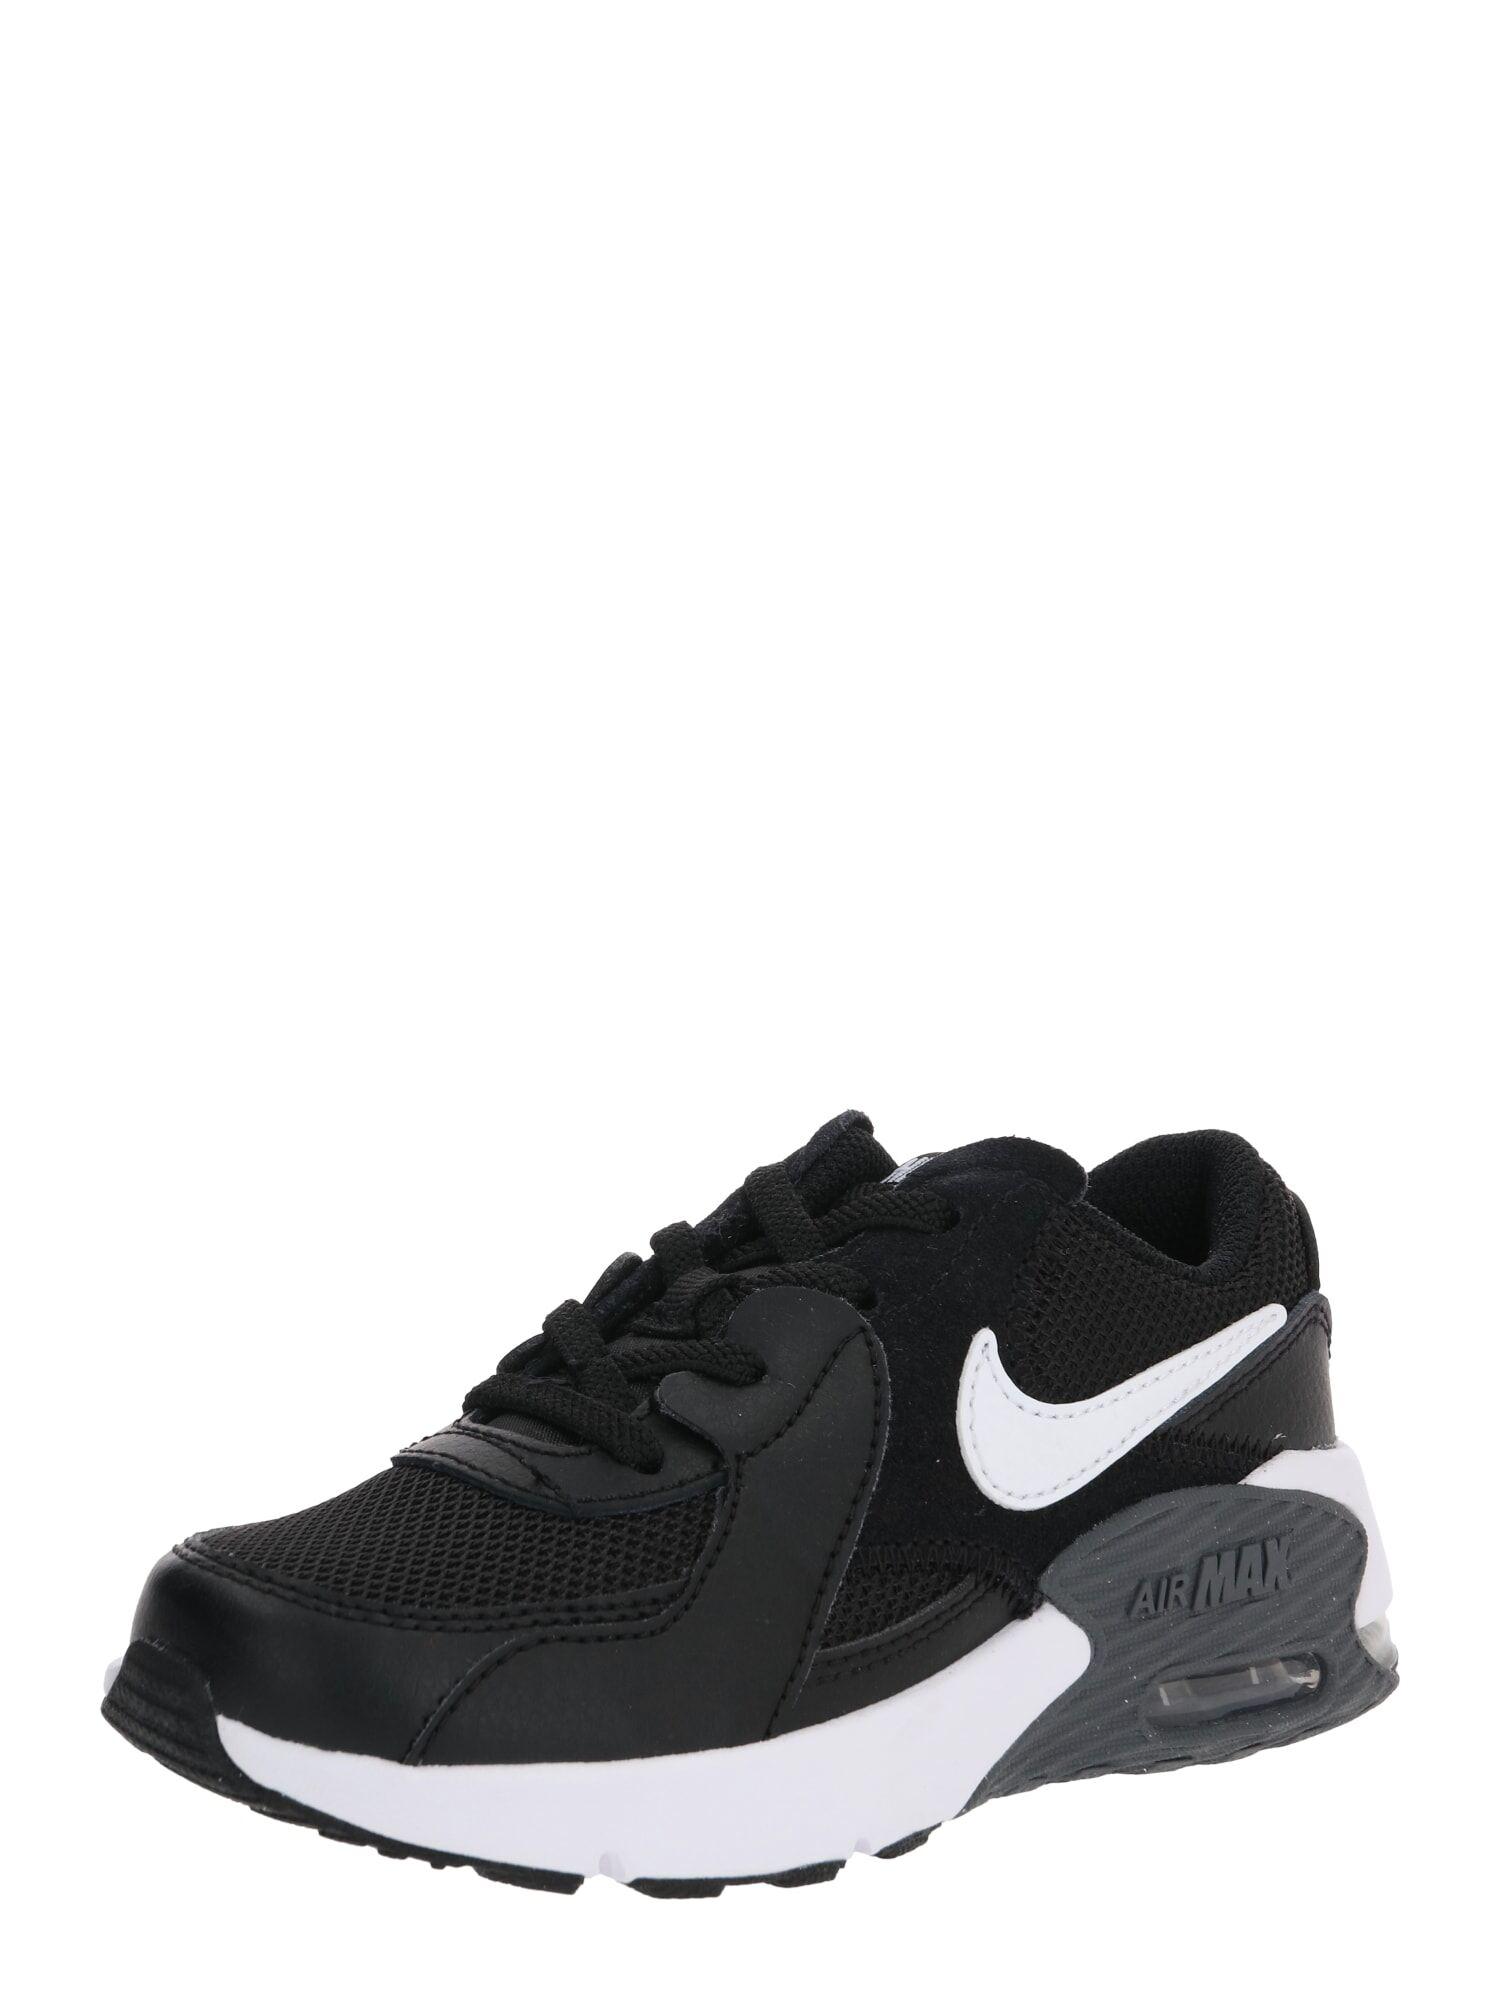 Nike Sportswear Baskets 'Nike Air Max Excee'  - Noir - Taille: 1Y - girl